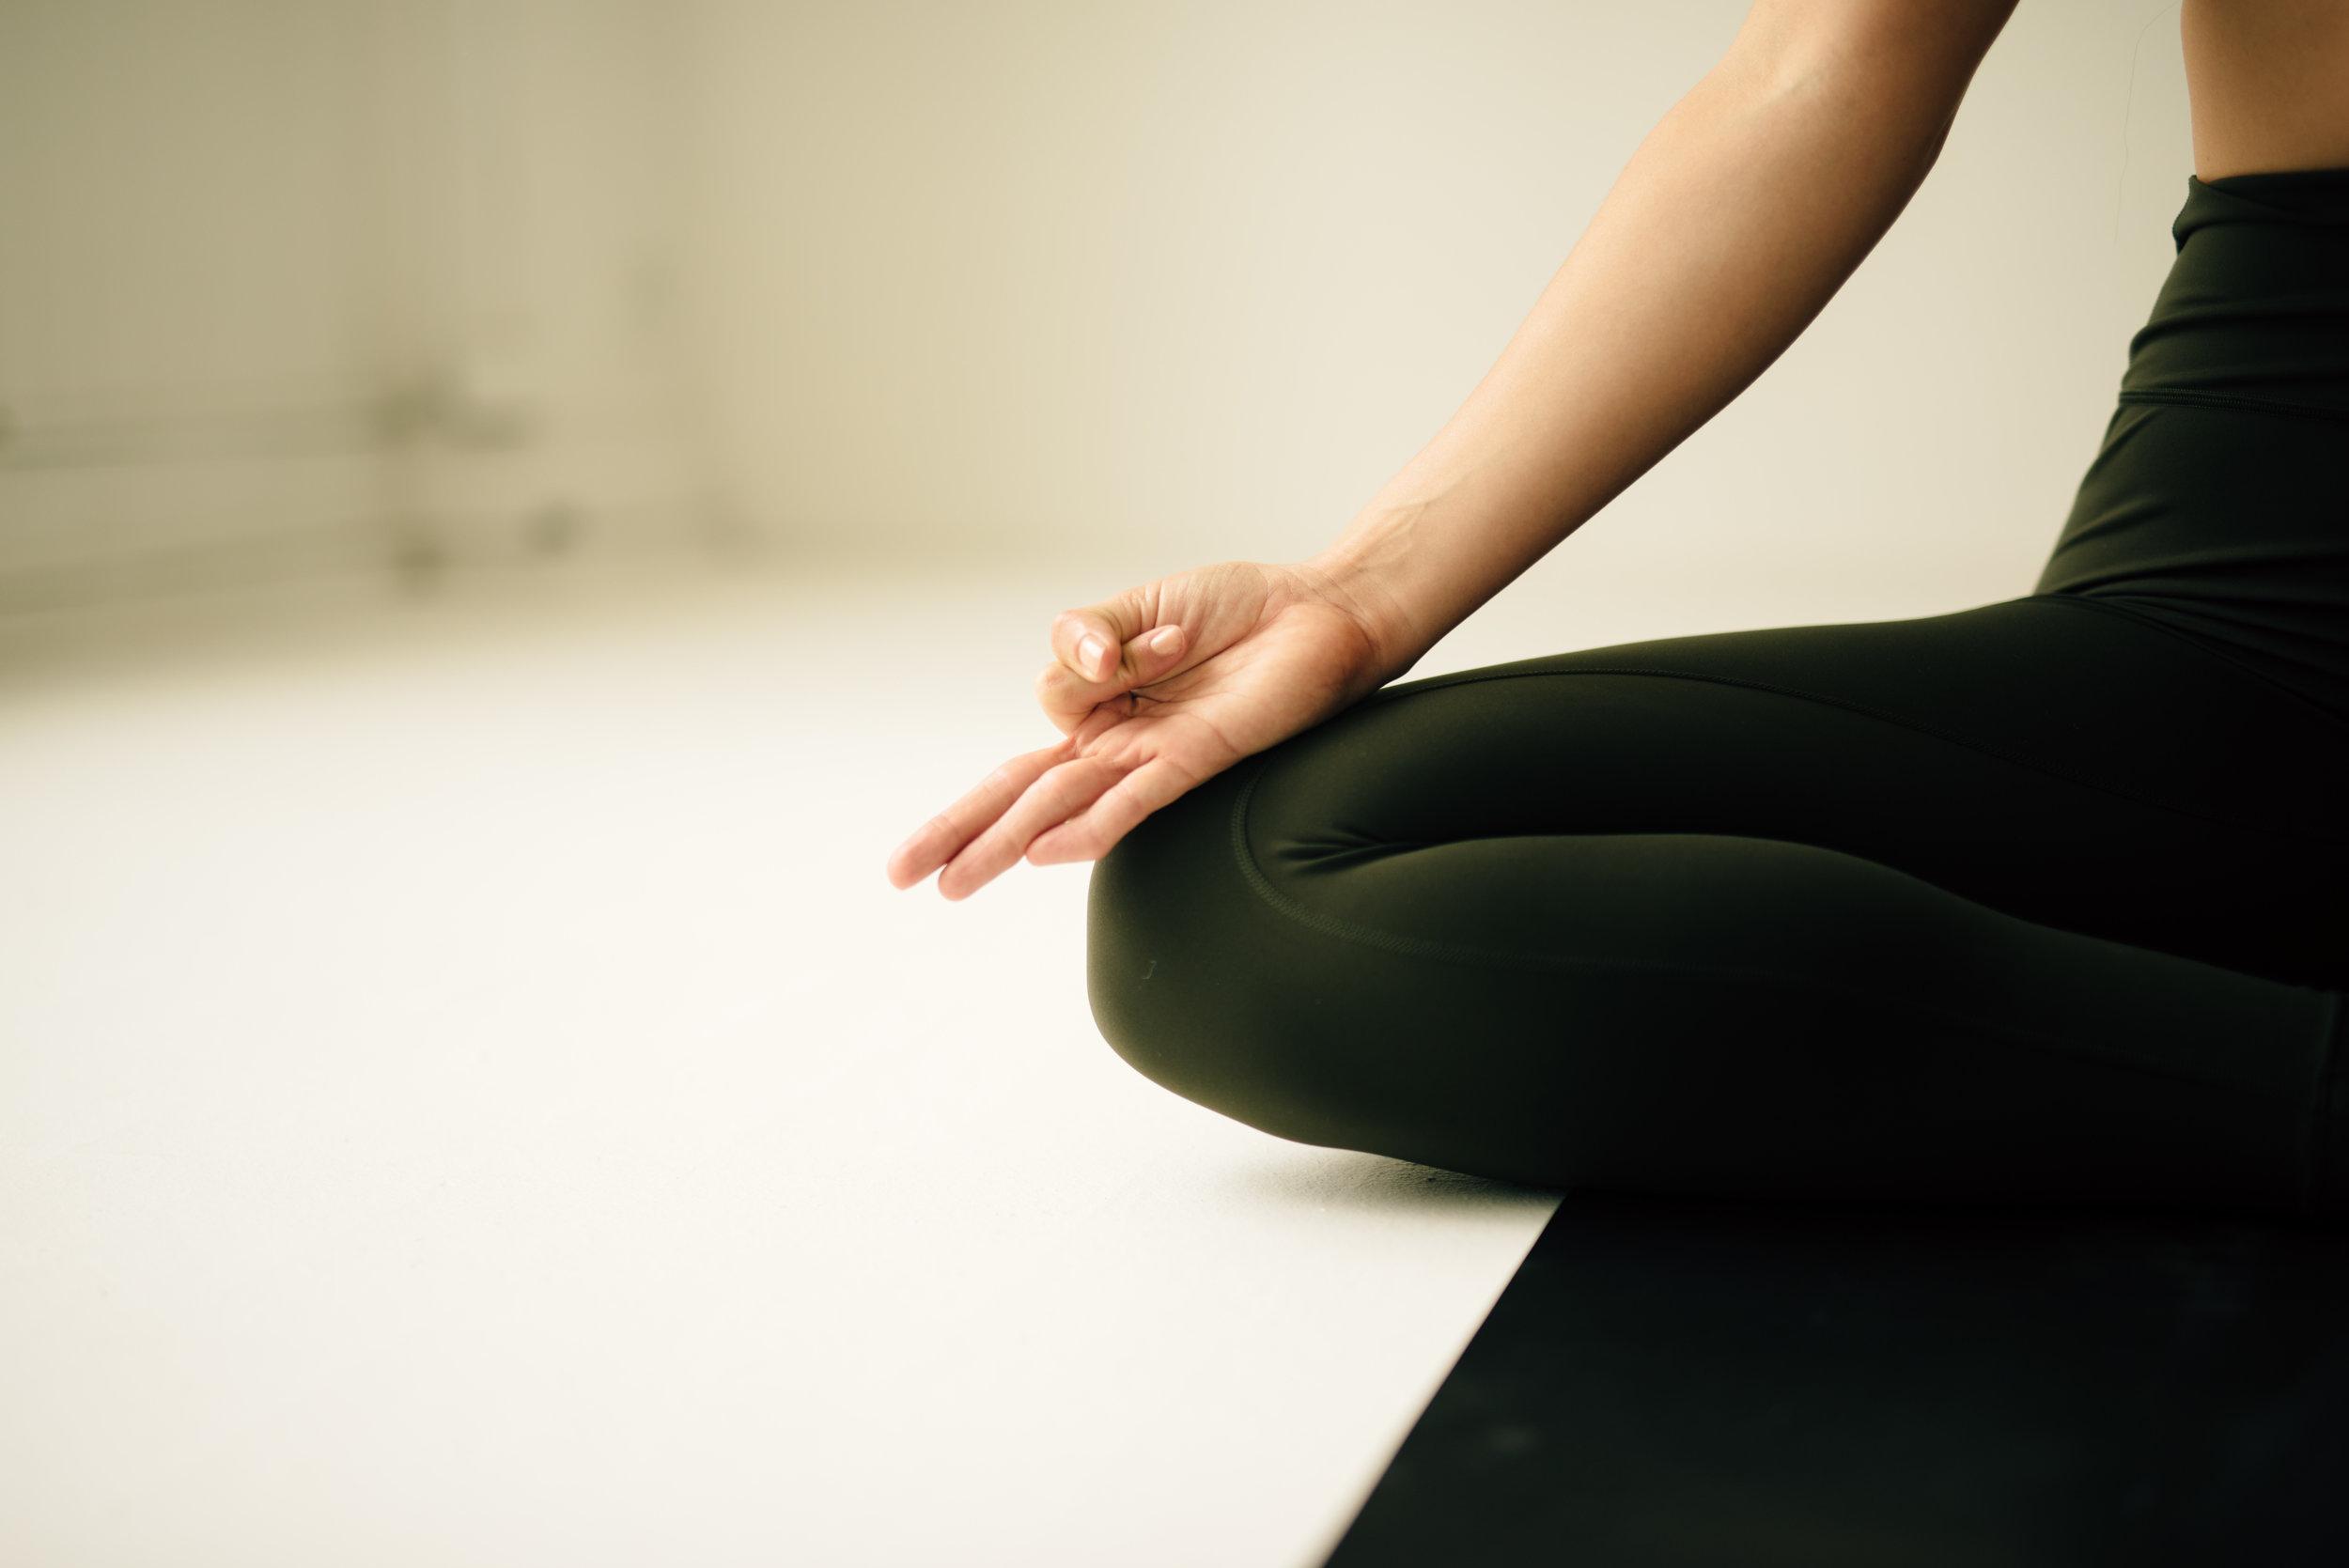 Renee-Yoga-July2019-JenniferMcCord-Edits-427.jpg